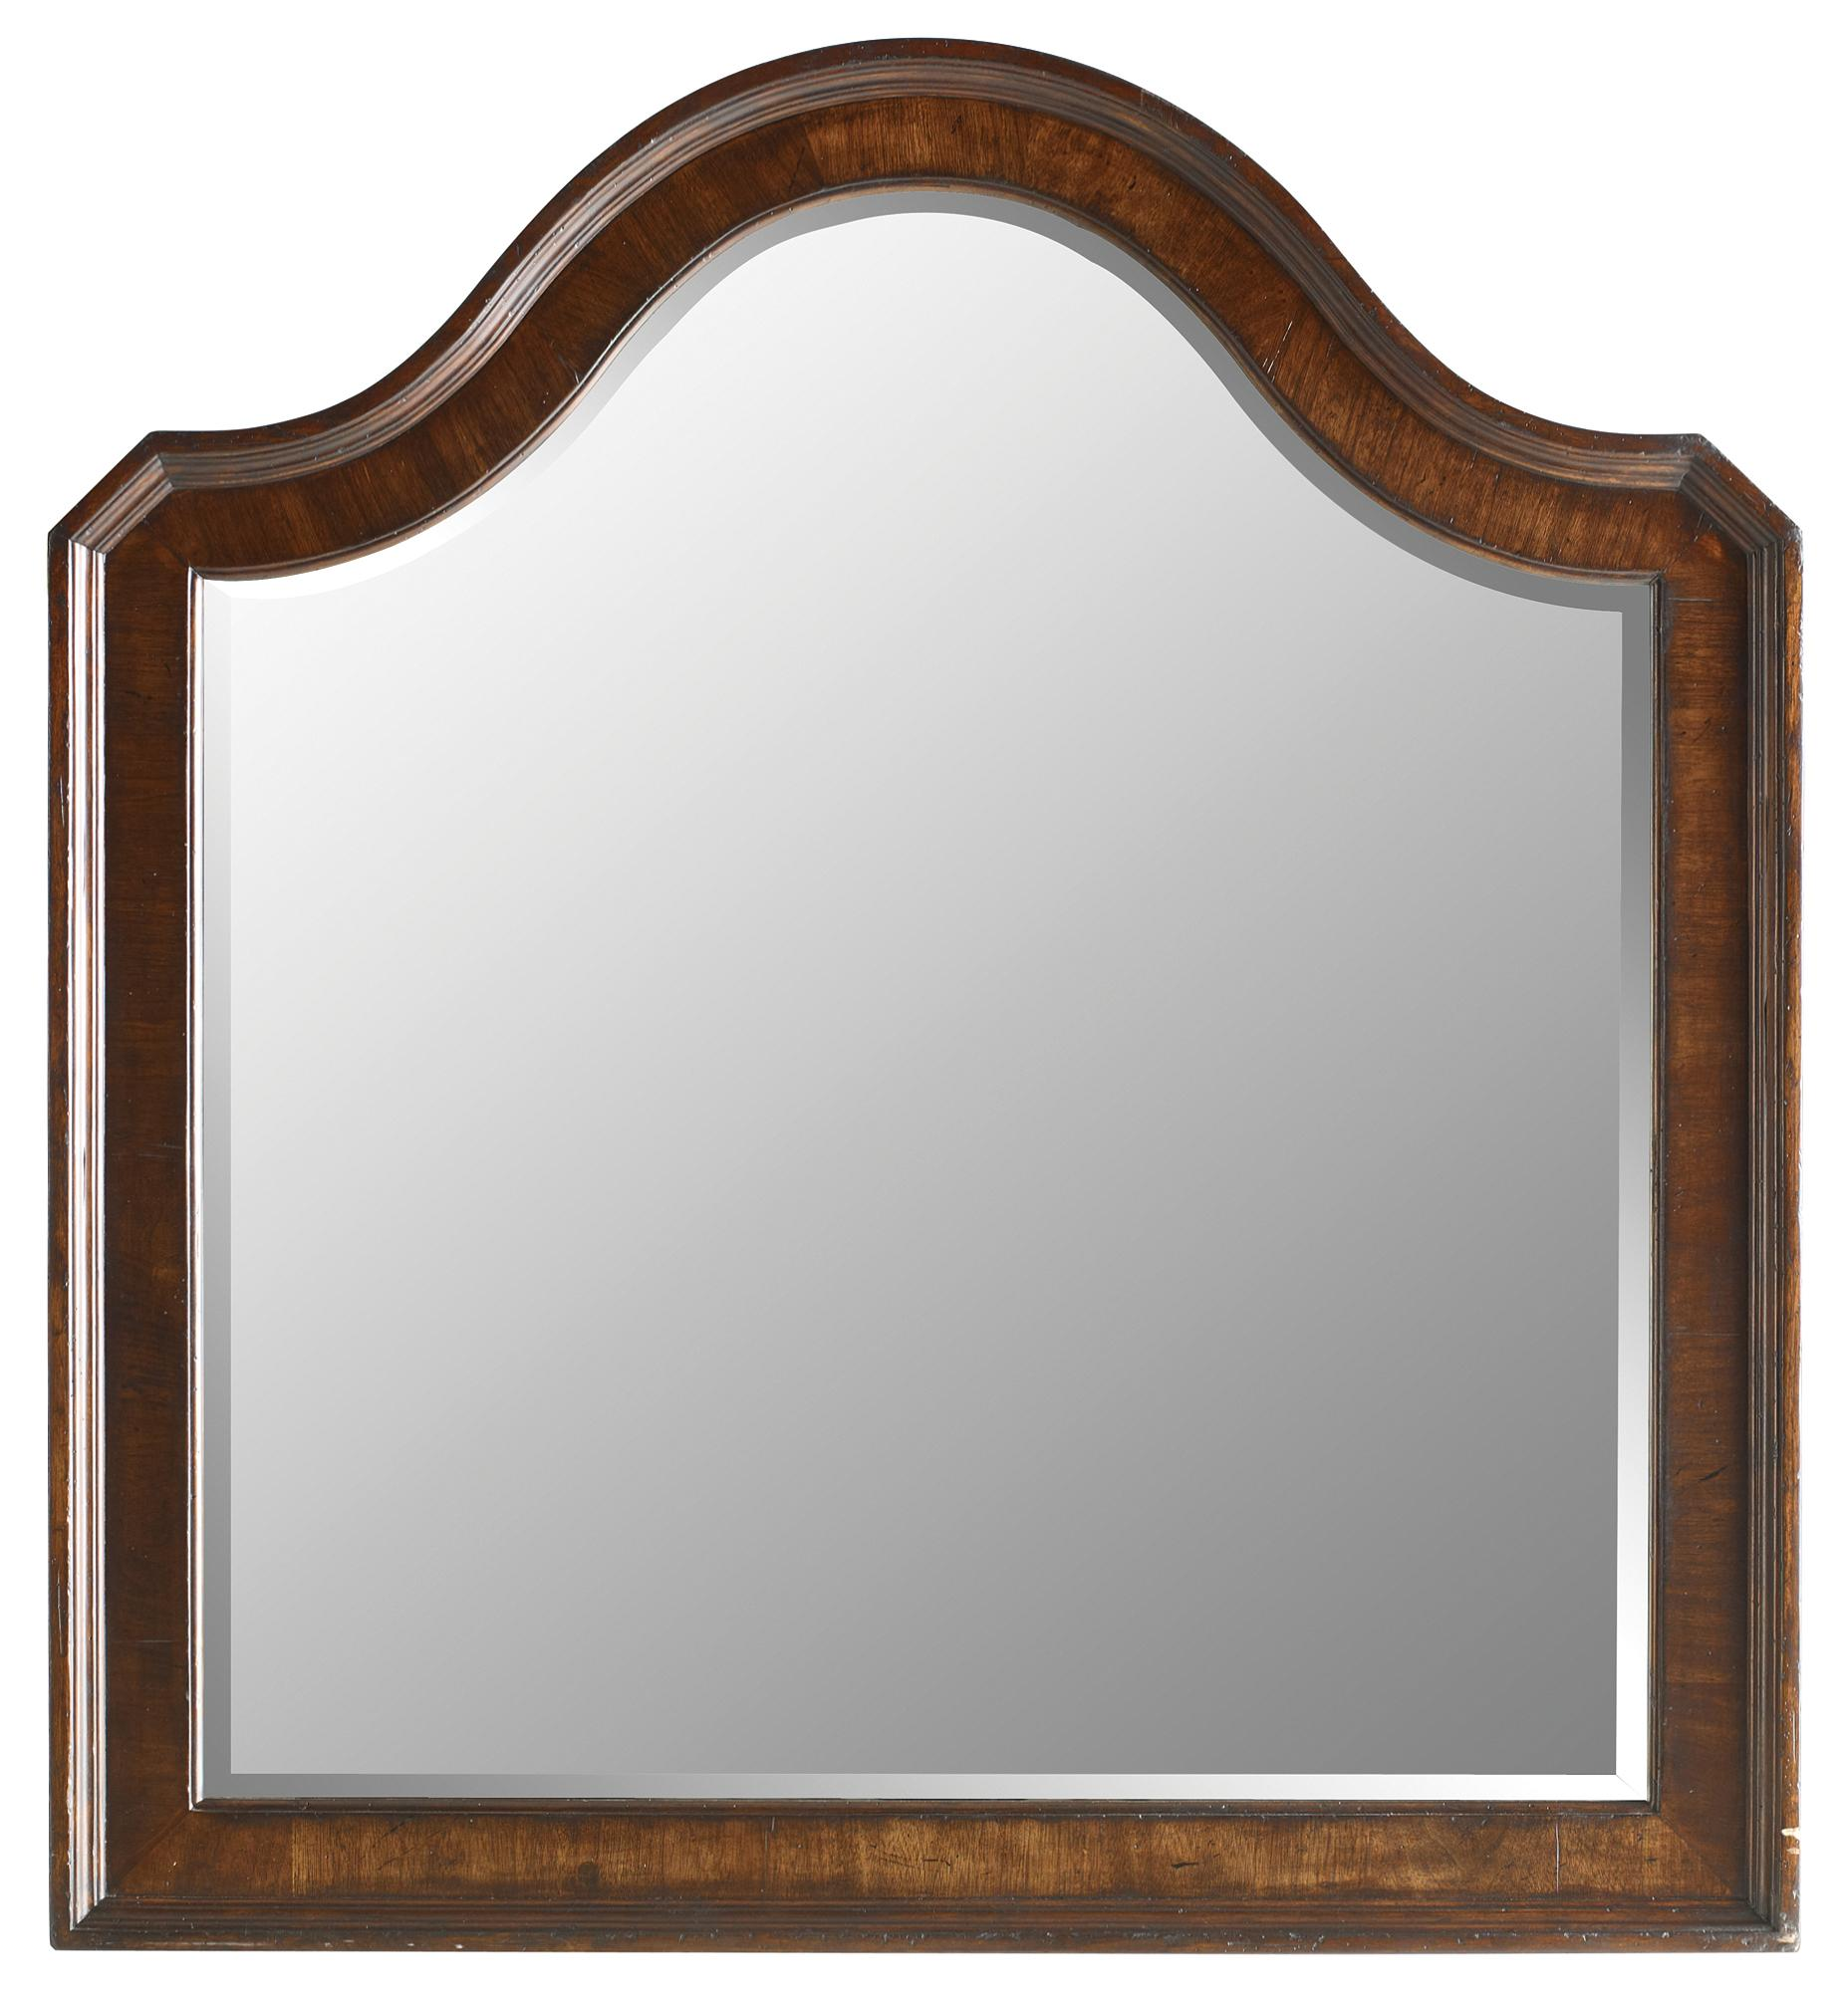 Stanley Furniture The Classic Portfolio Continental Landscape Mirror - Item Number: 128-13-30